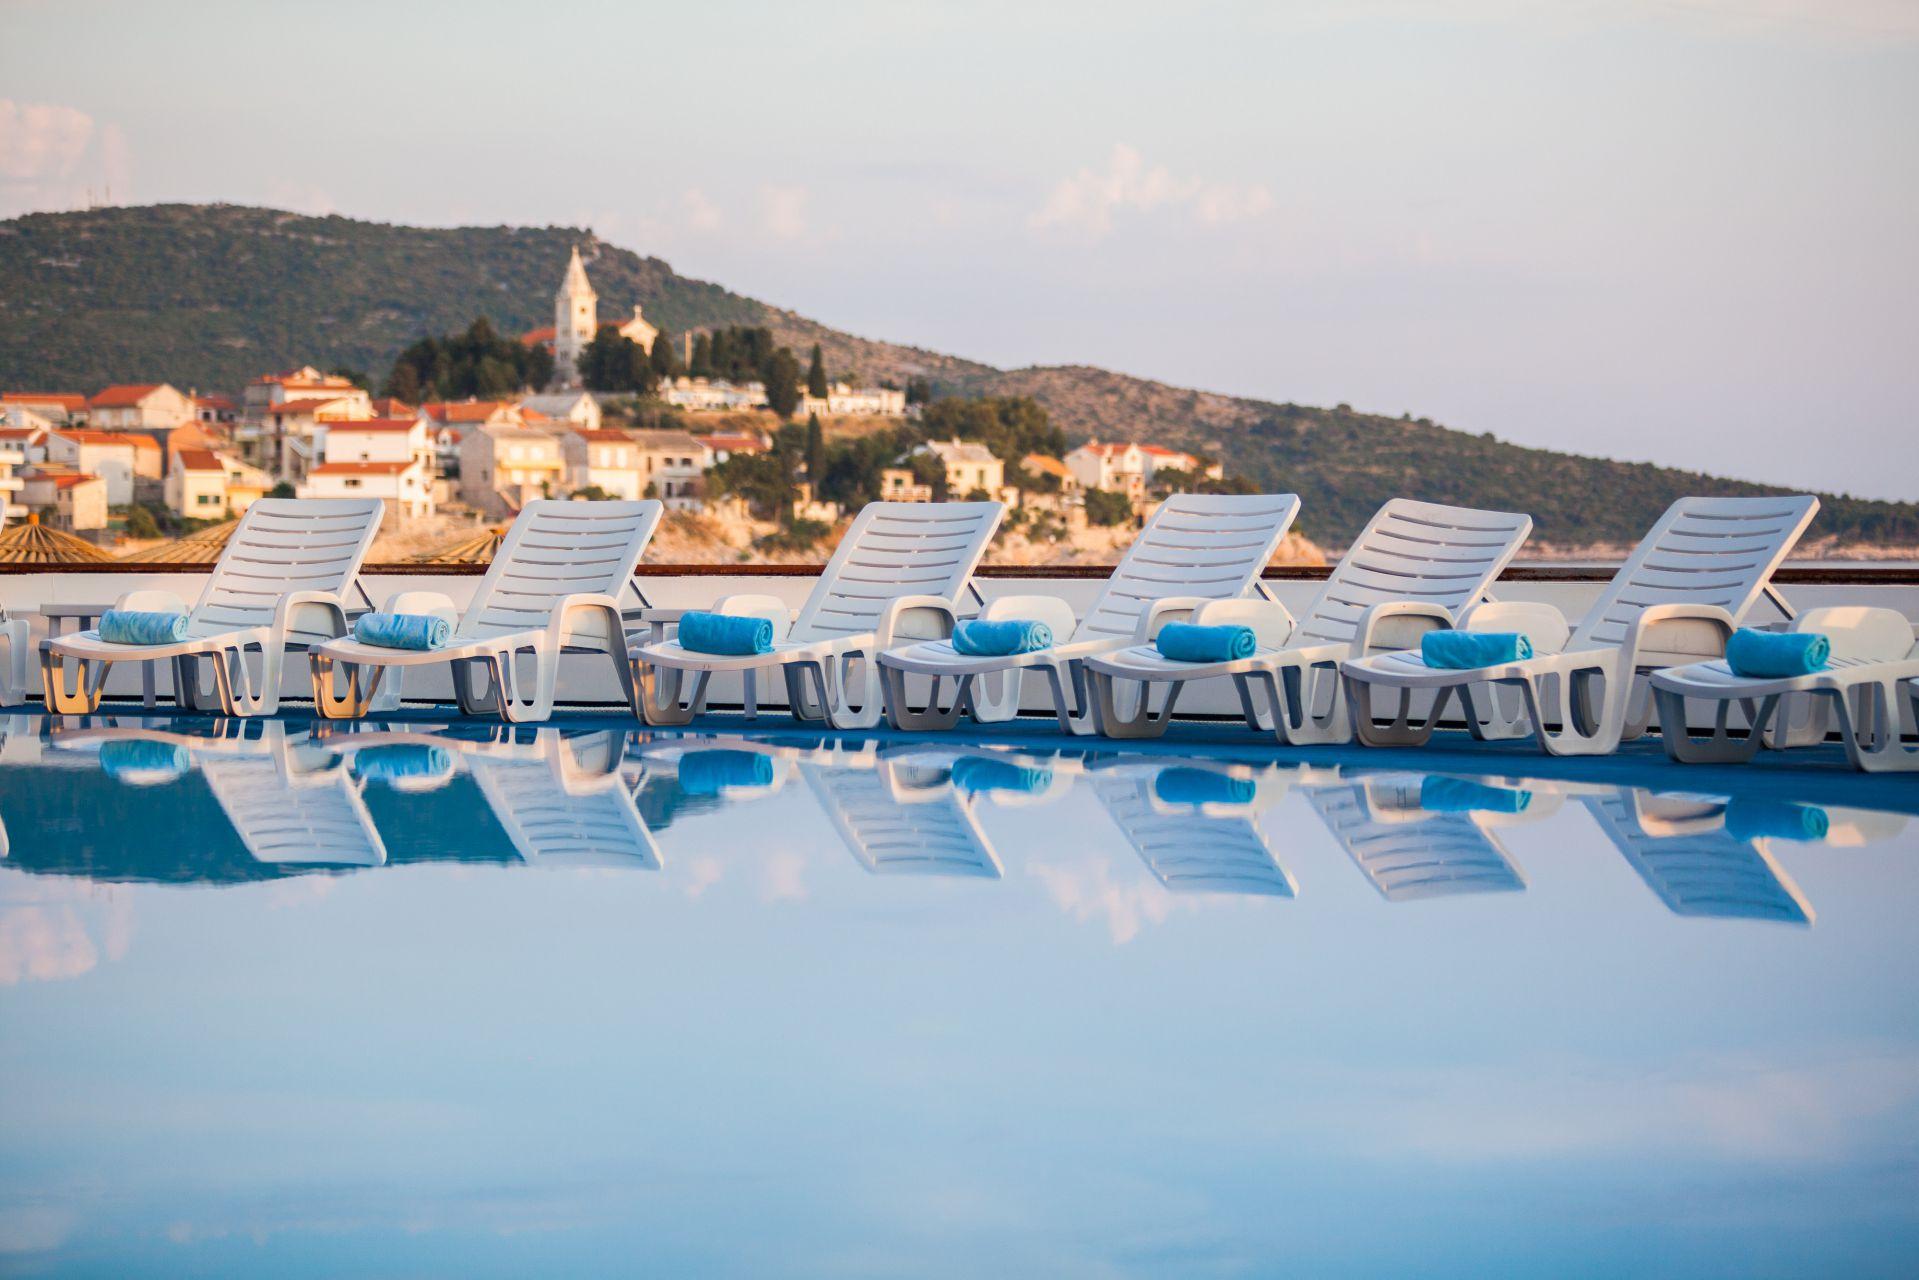 swimming pool 04 14823507874 o - Zora Hotel